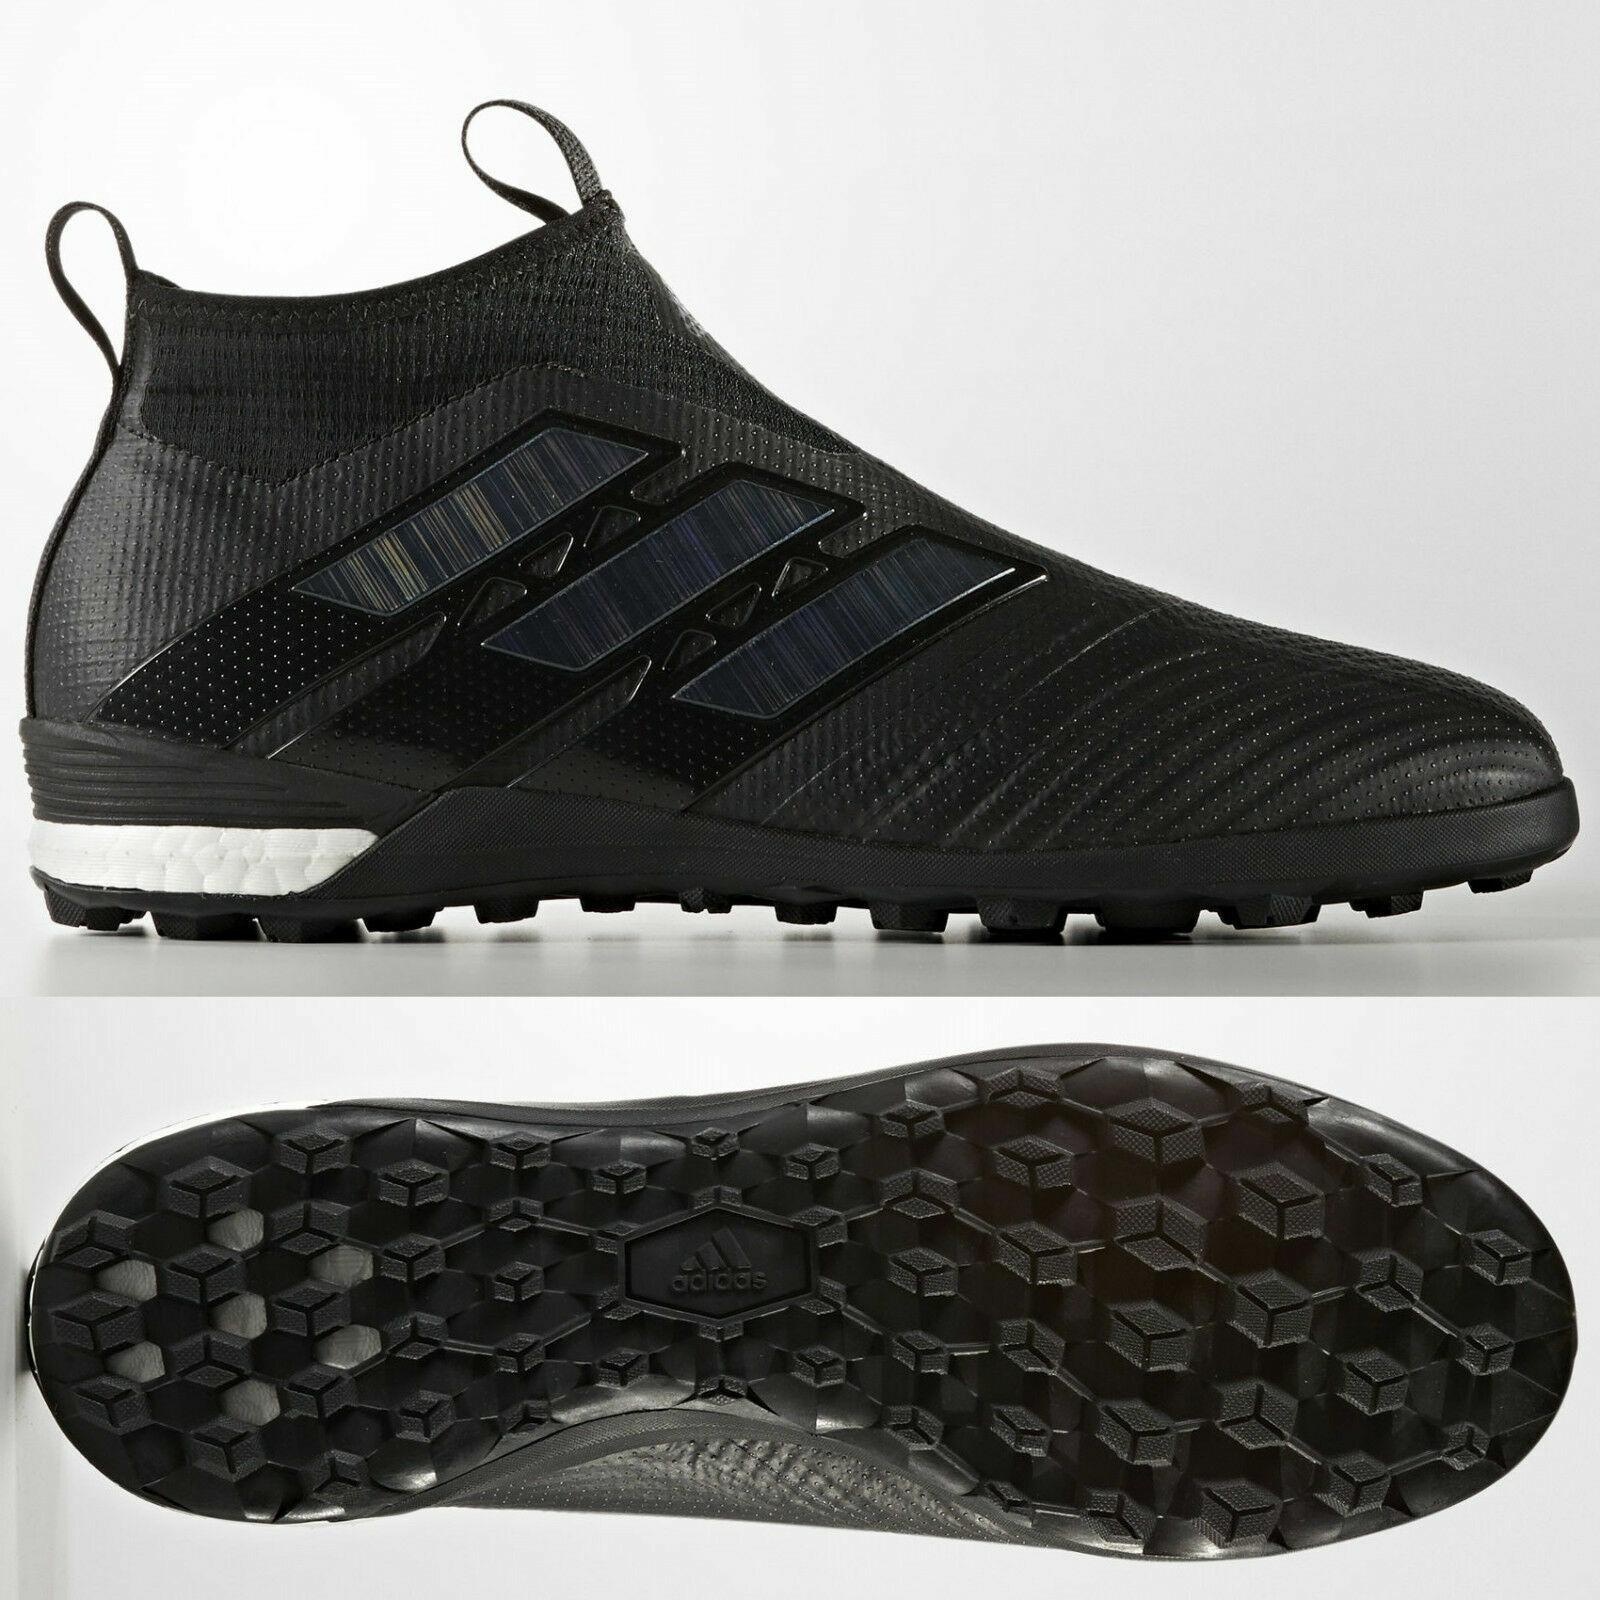 Adidas Mens Ace Tango Purecontrol Black BY1942 sz 8 Ultra Boost W Dust Bag $180